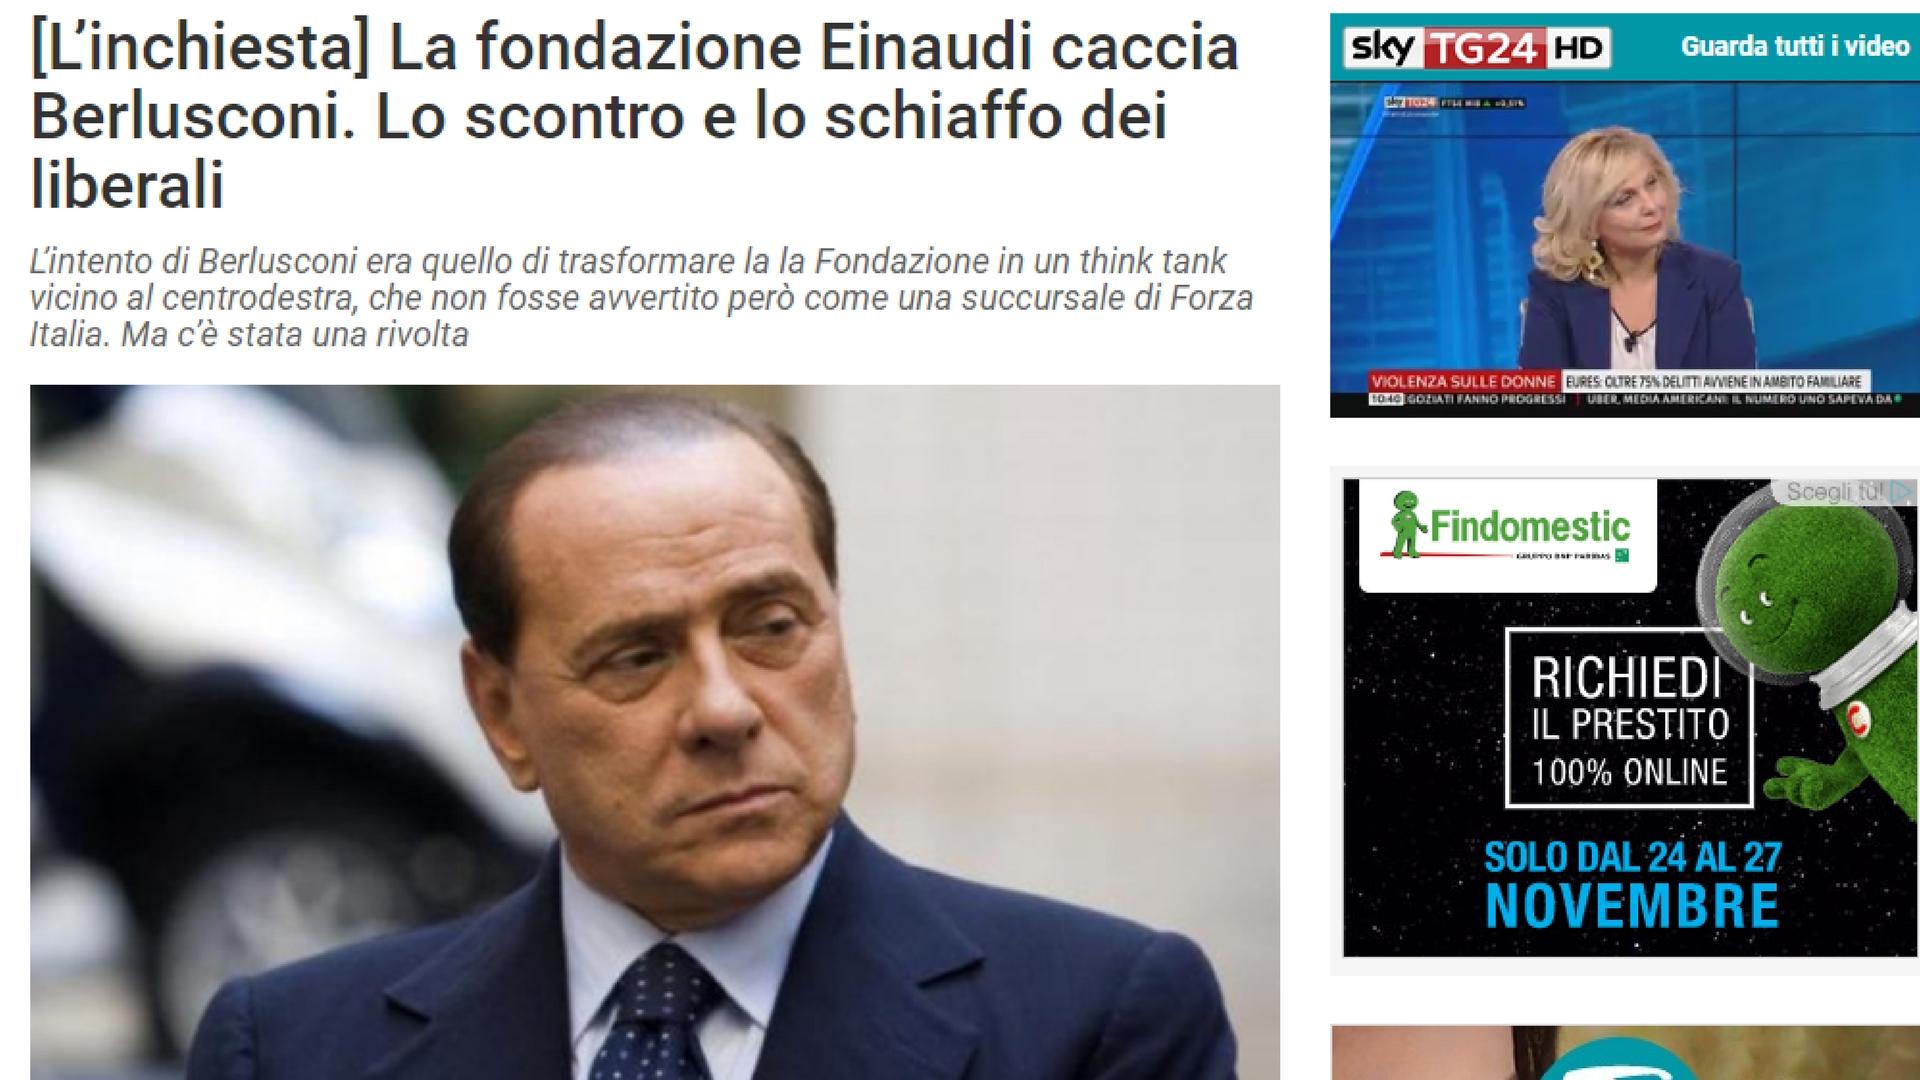 Fondazione Einaudi, quando Berlusconi cercò di prenderla